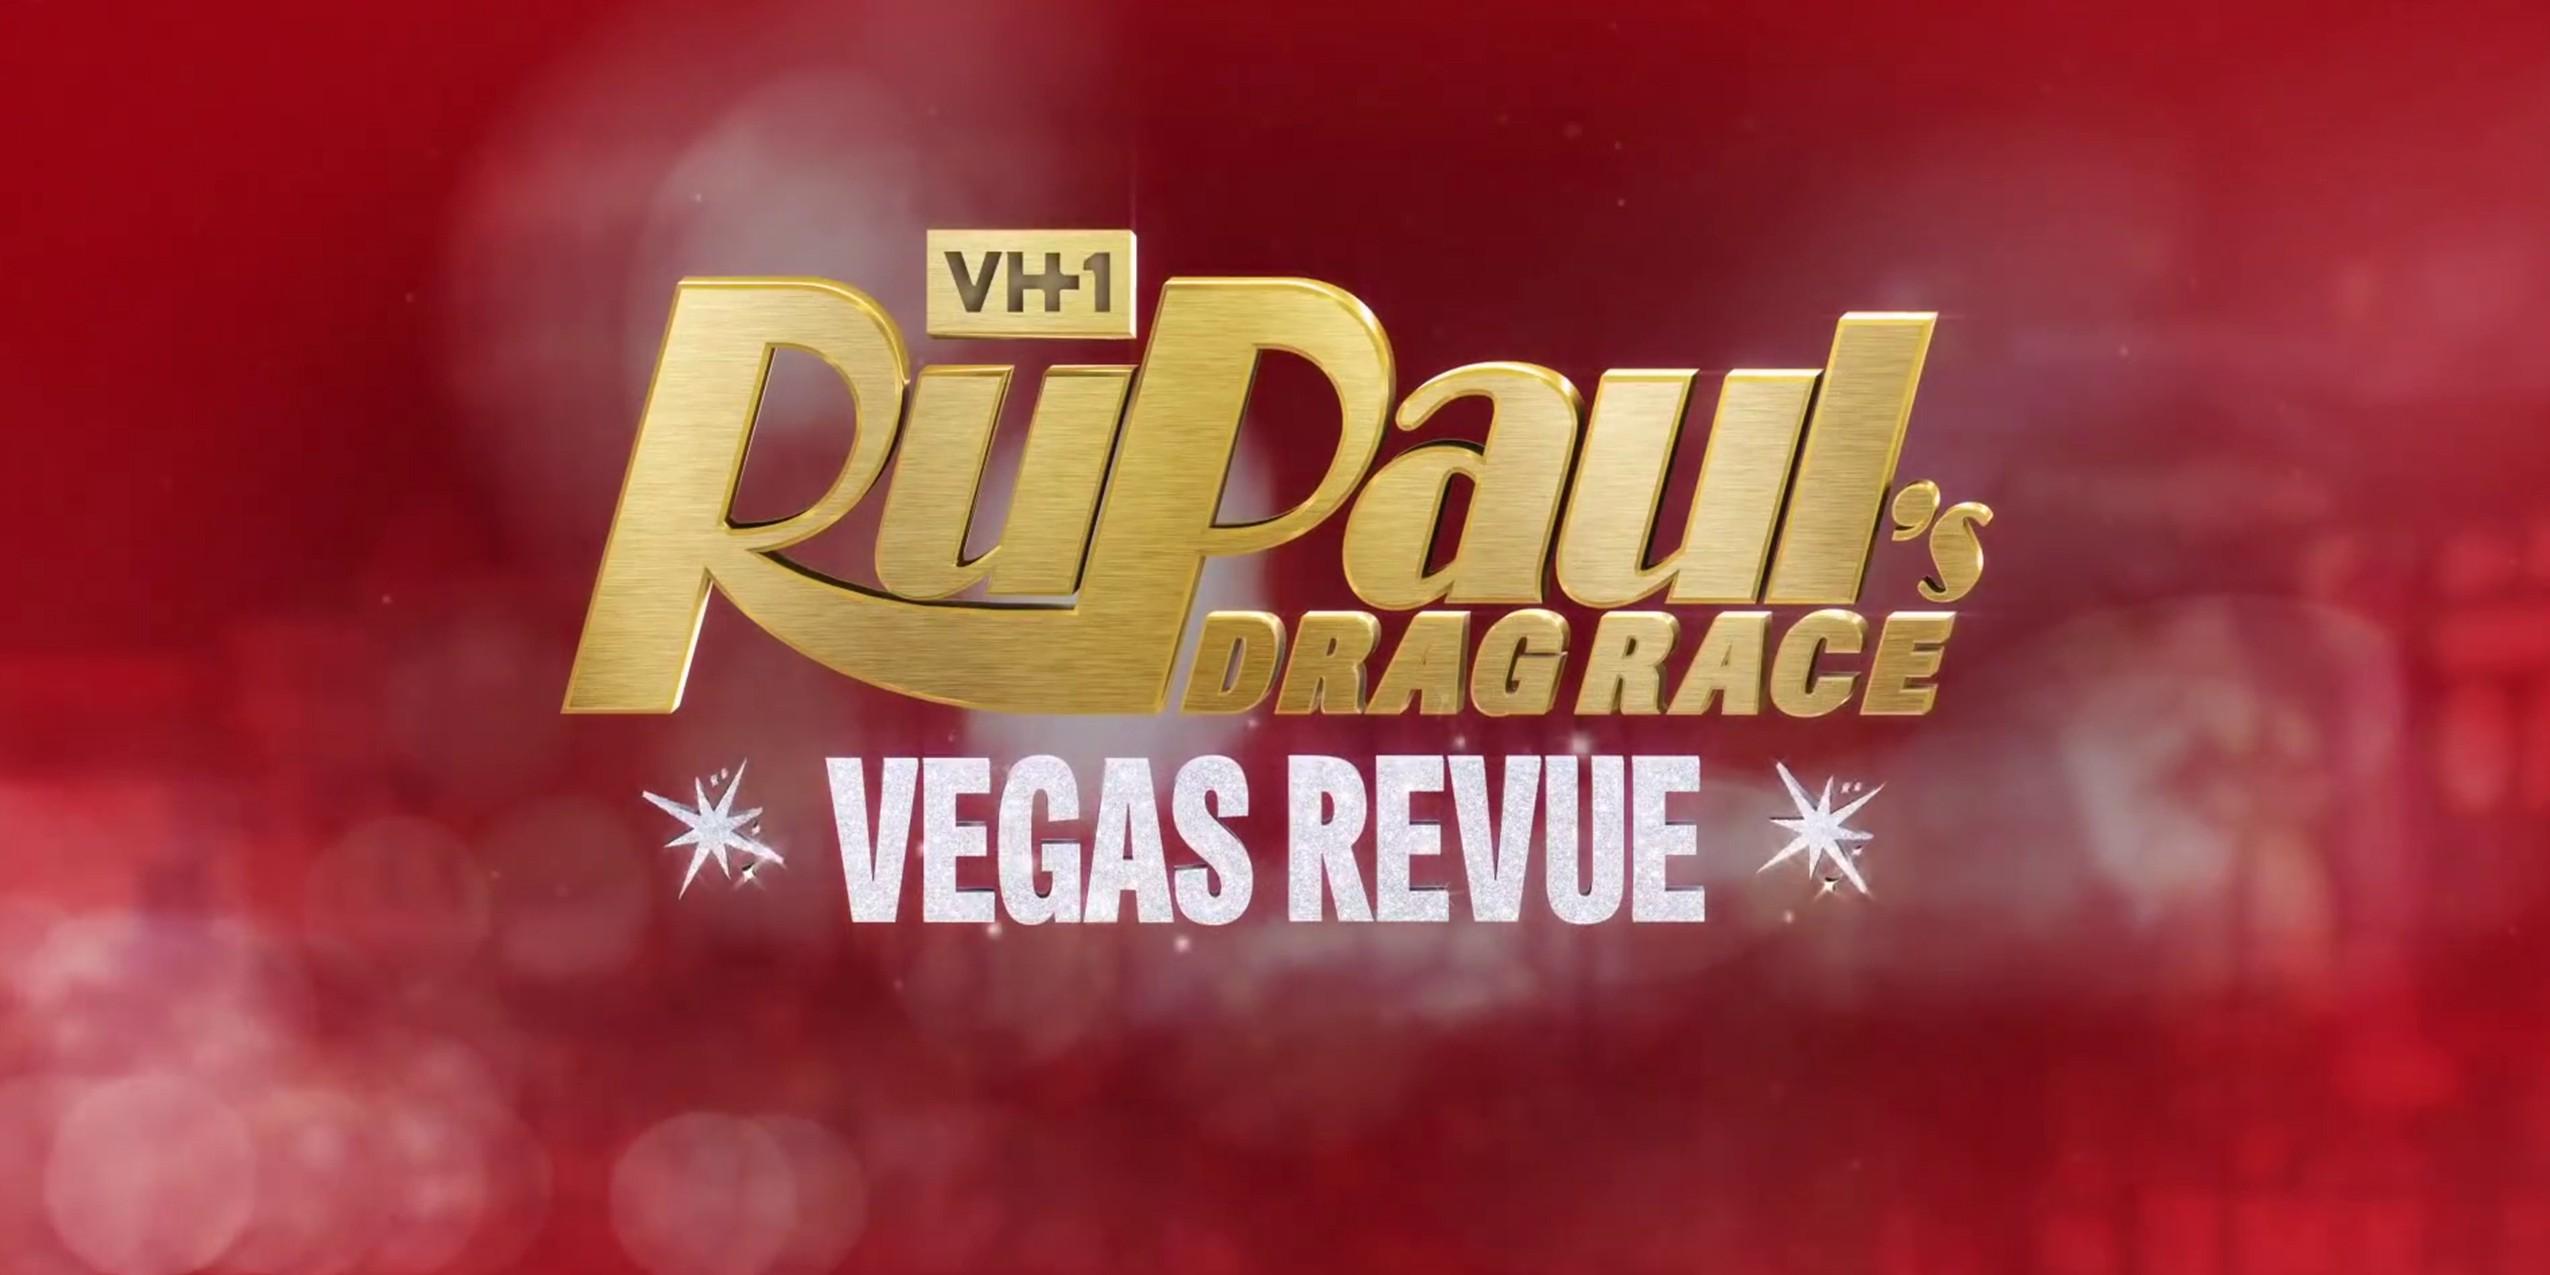 Rupaul's Drag Race Vegas Revue : Ep 1 ESPAÑOL